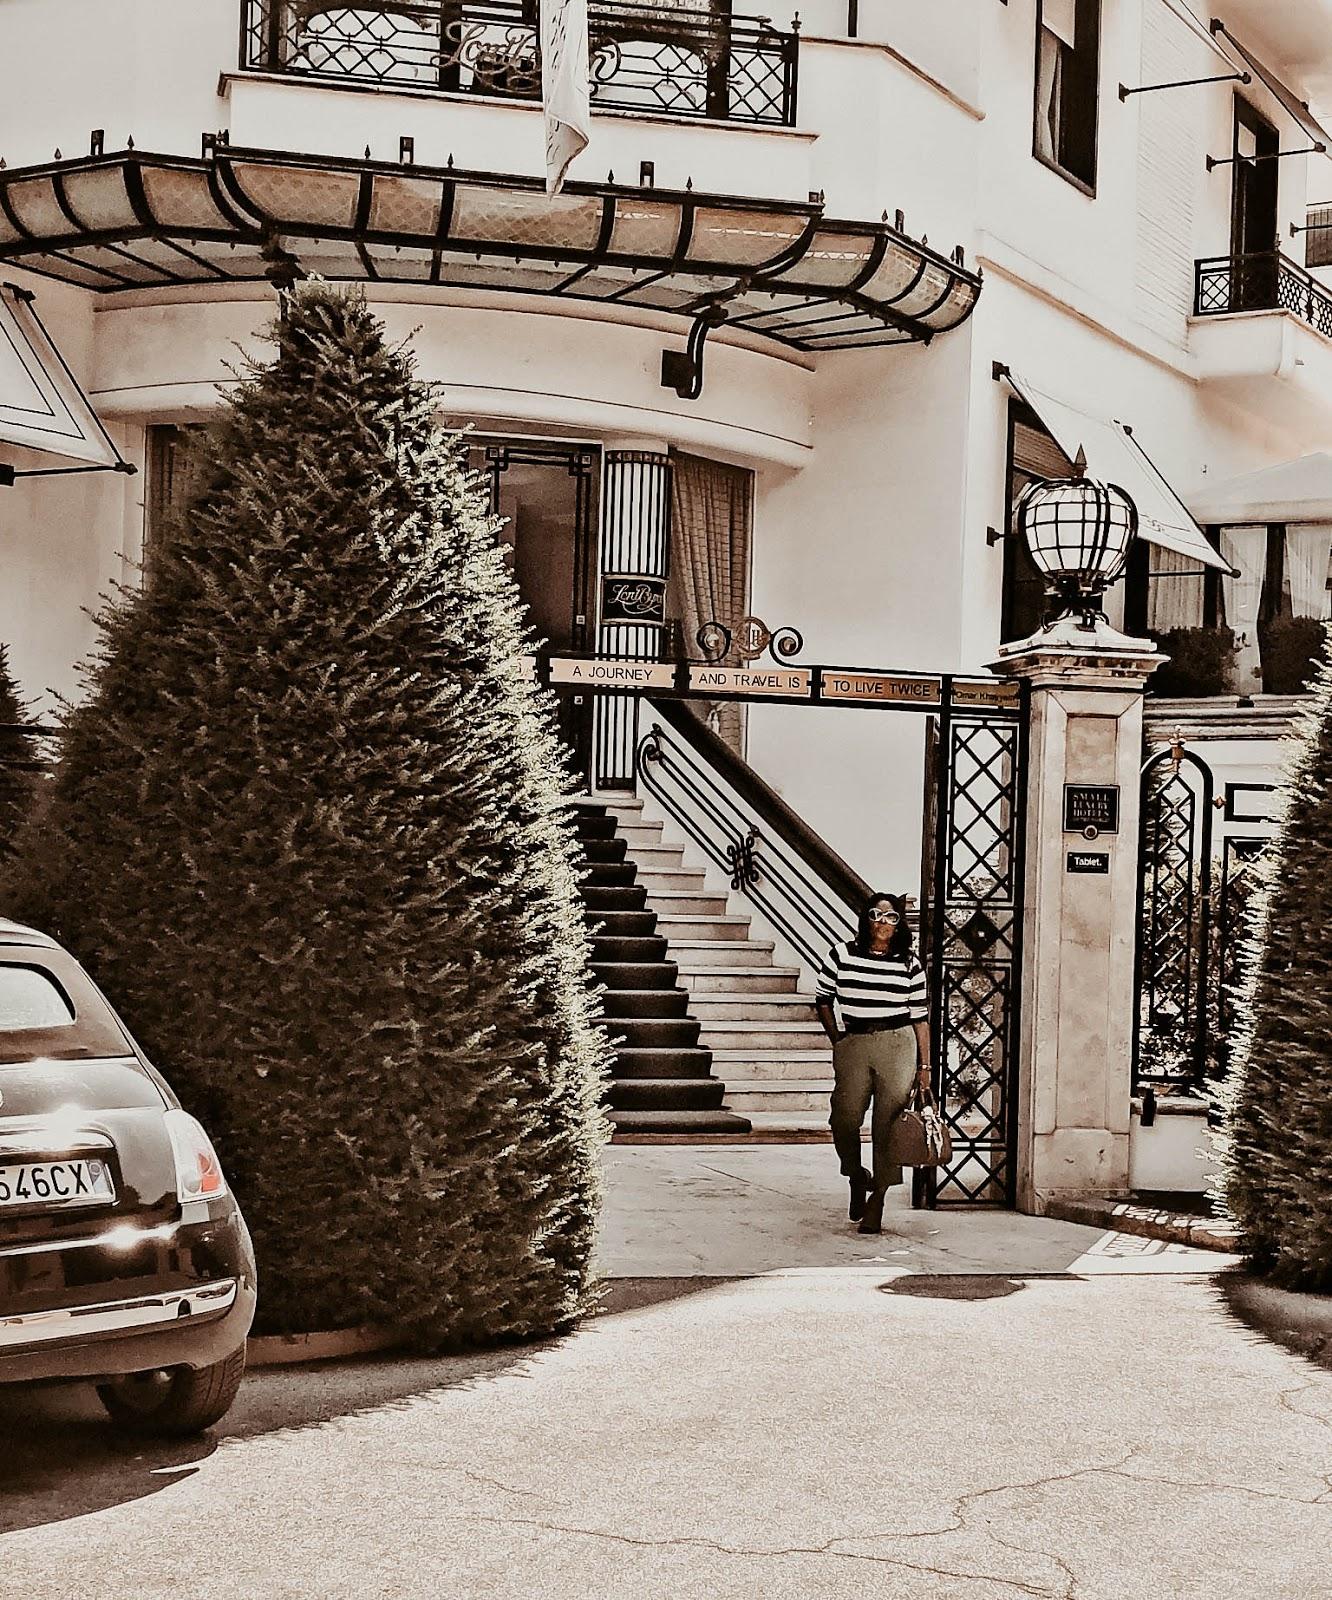 holland-america-veendam-24day-mediterranean-greek-odyssey-cruise-2019-lord-byron-roma-firenze-hotel